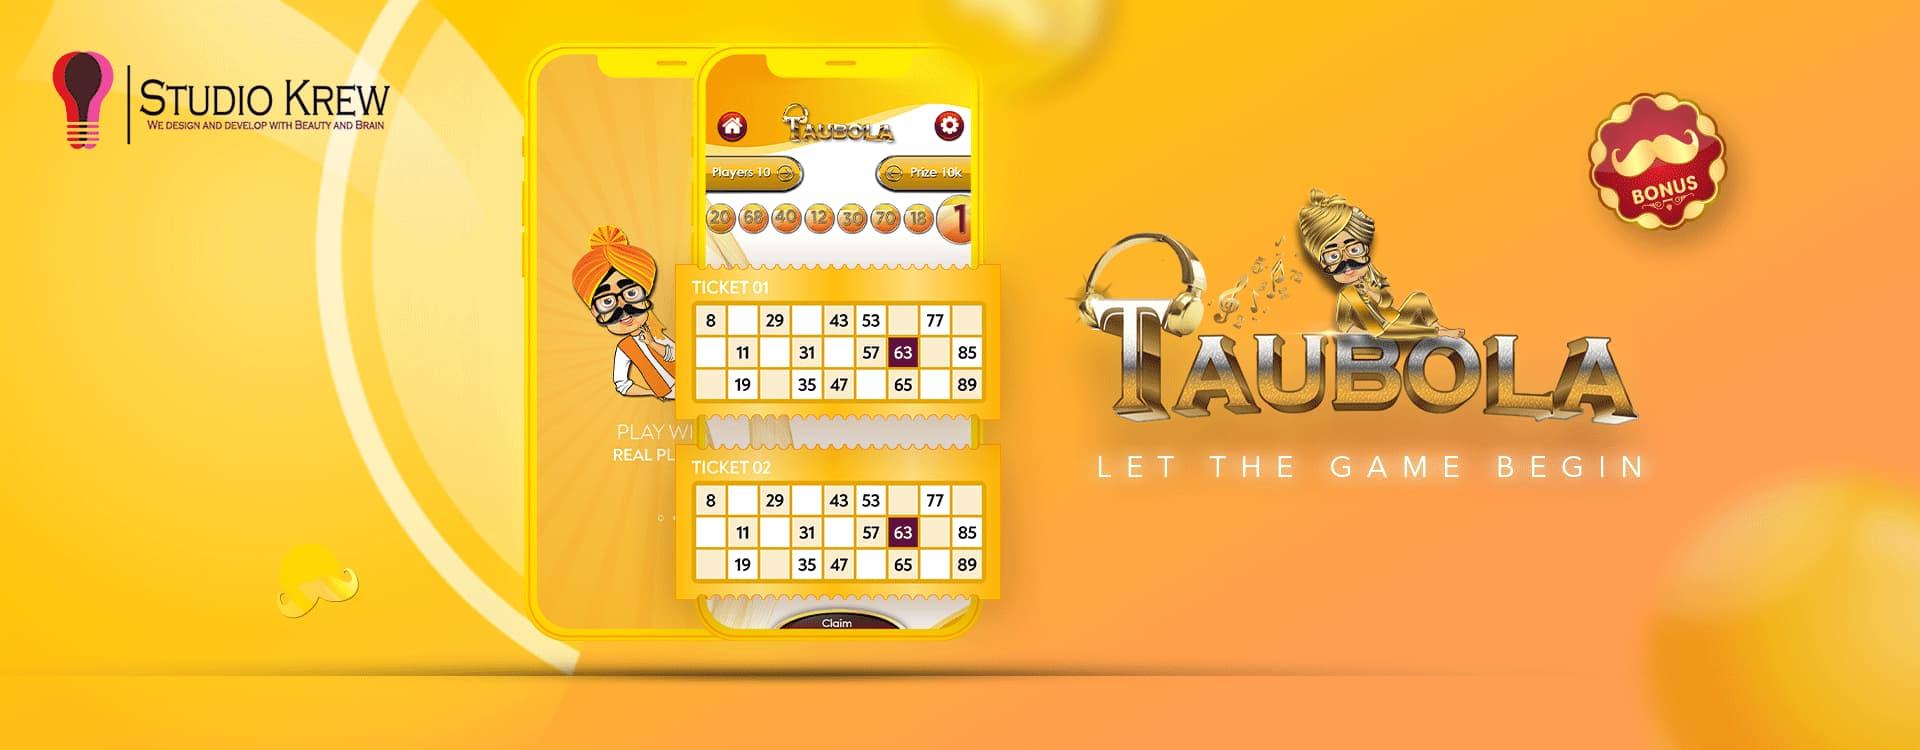 Realmoney game development company, Online Bingo game development